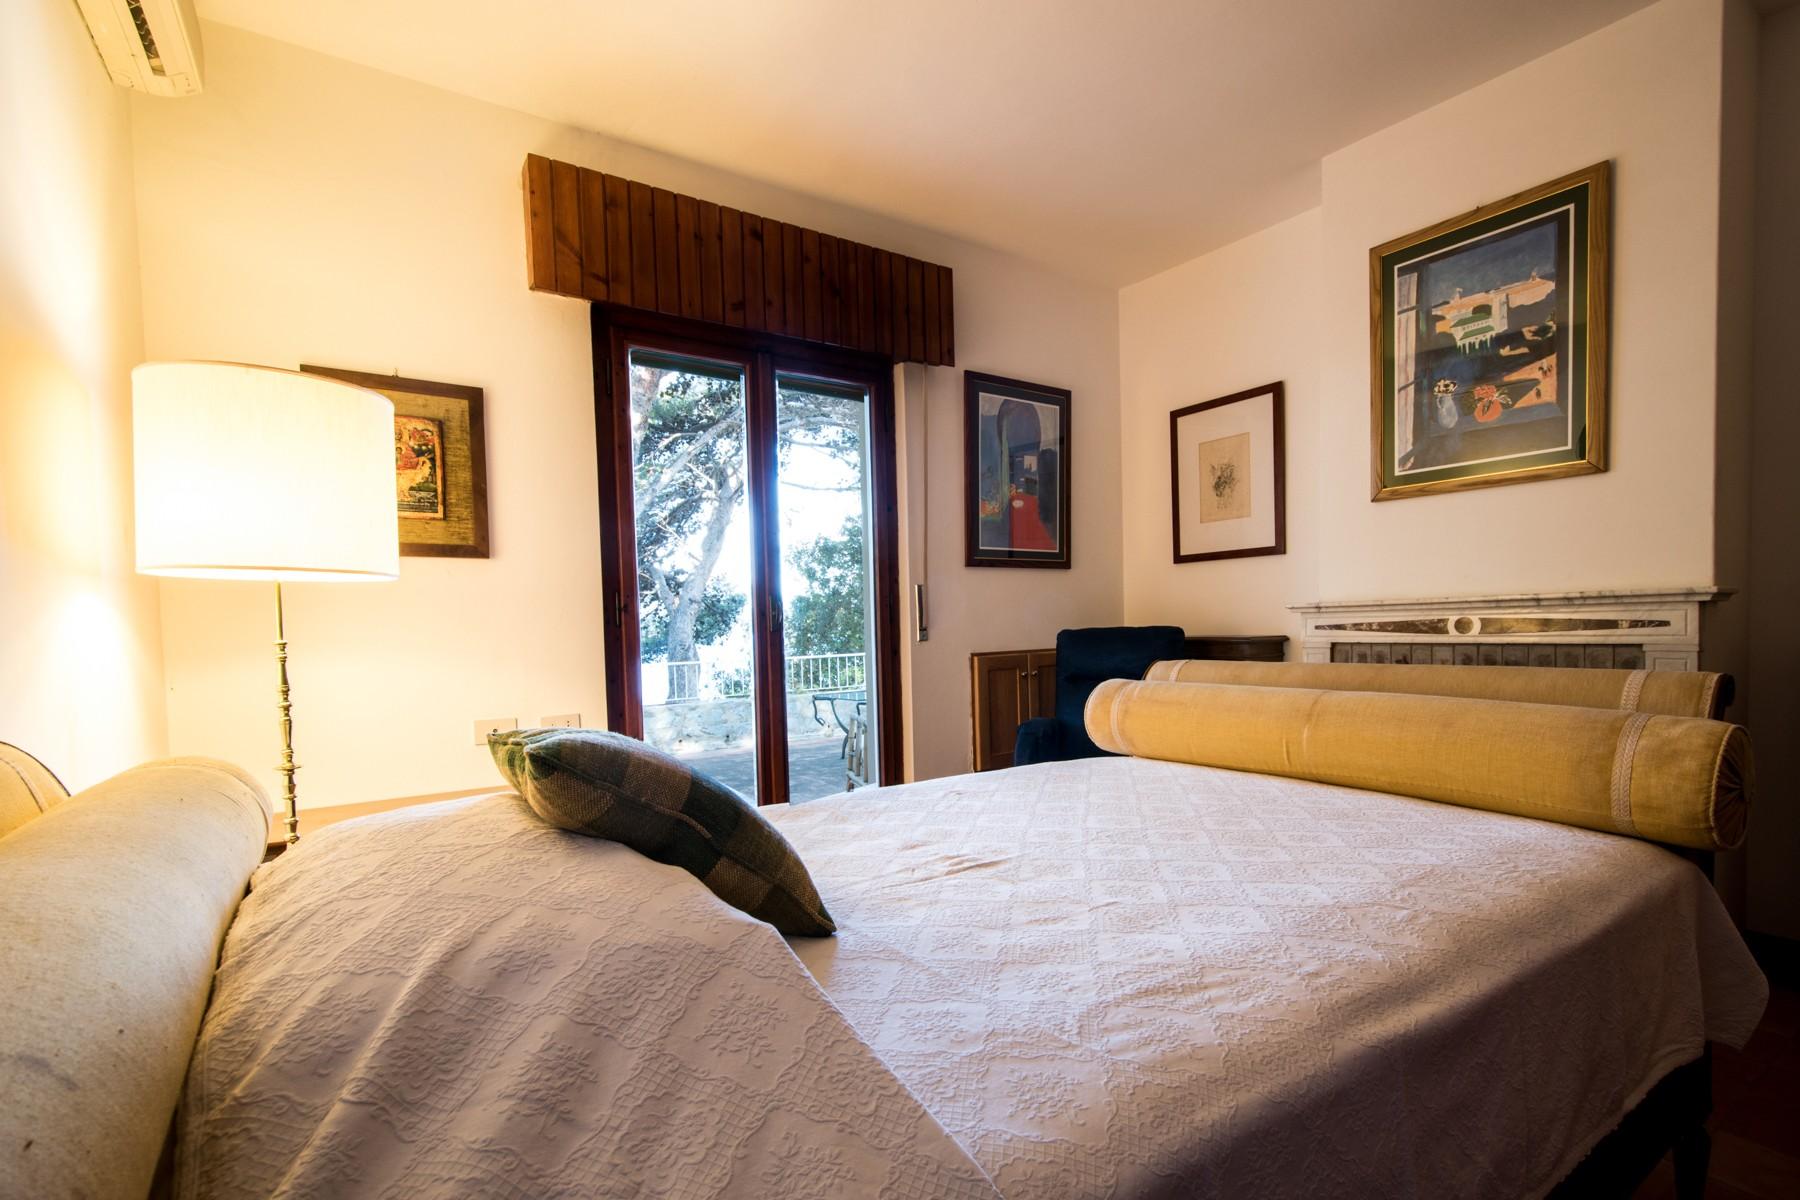 Villa in Vendita a Marciana: 5 locali, 300 mq - Foto 8